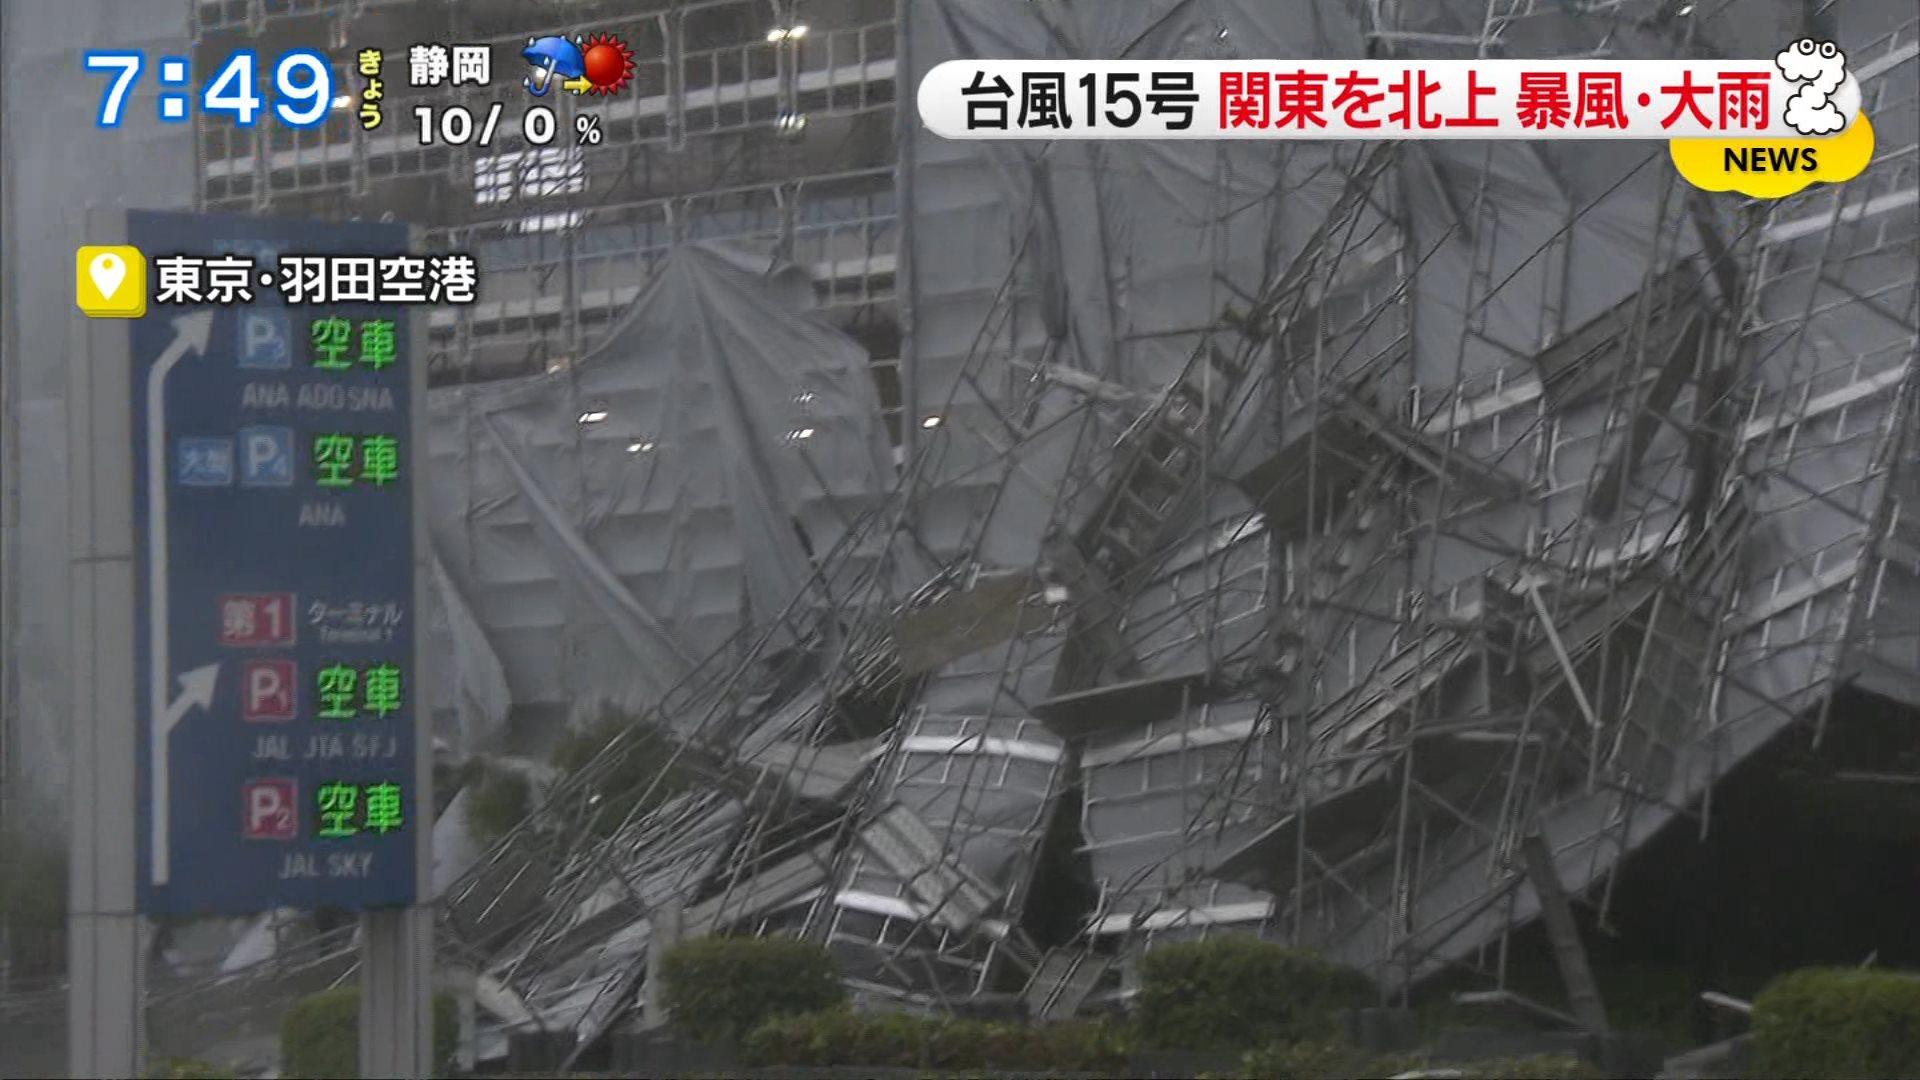 画像,#羽田空港 立体駐車場の足場が倒壊 #ZIP https://t.co/cGY9VwmsX9。